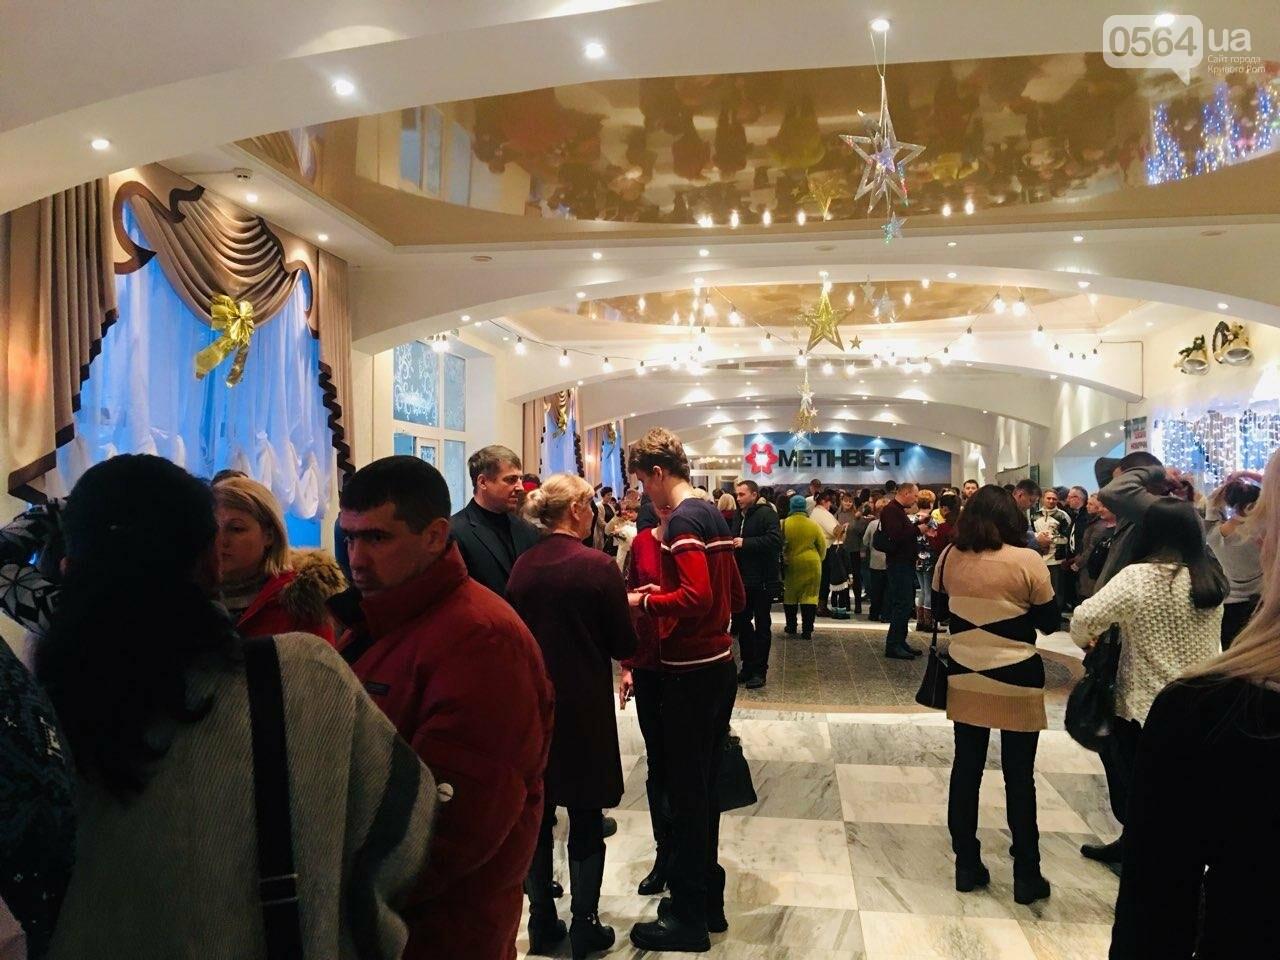 """Let it Snow"": на первое Рождество в Кривом Роге играют джаз, - ФОТО, ВИДЕО, фото-15"